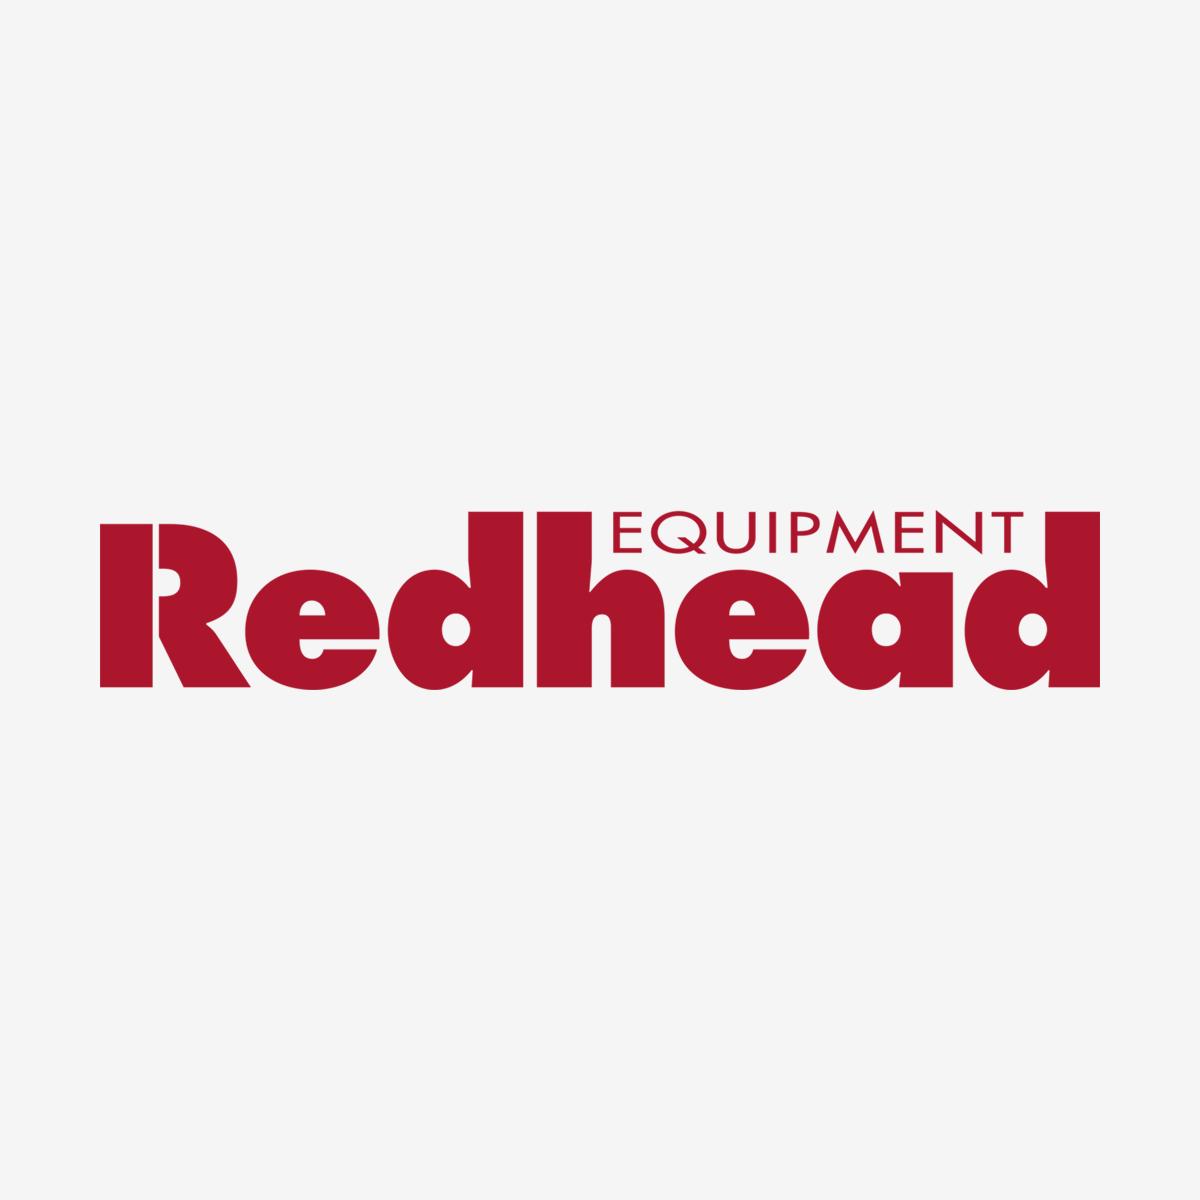 Redhead Equipment Ltd logo